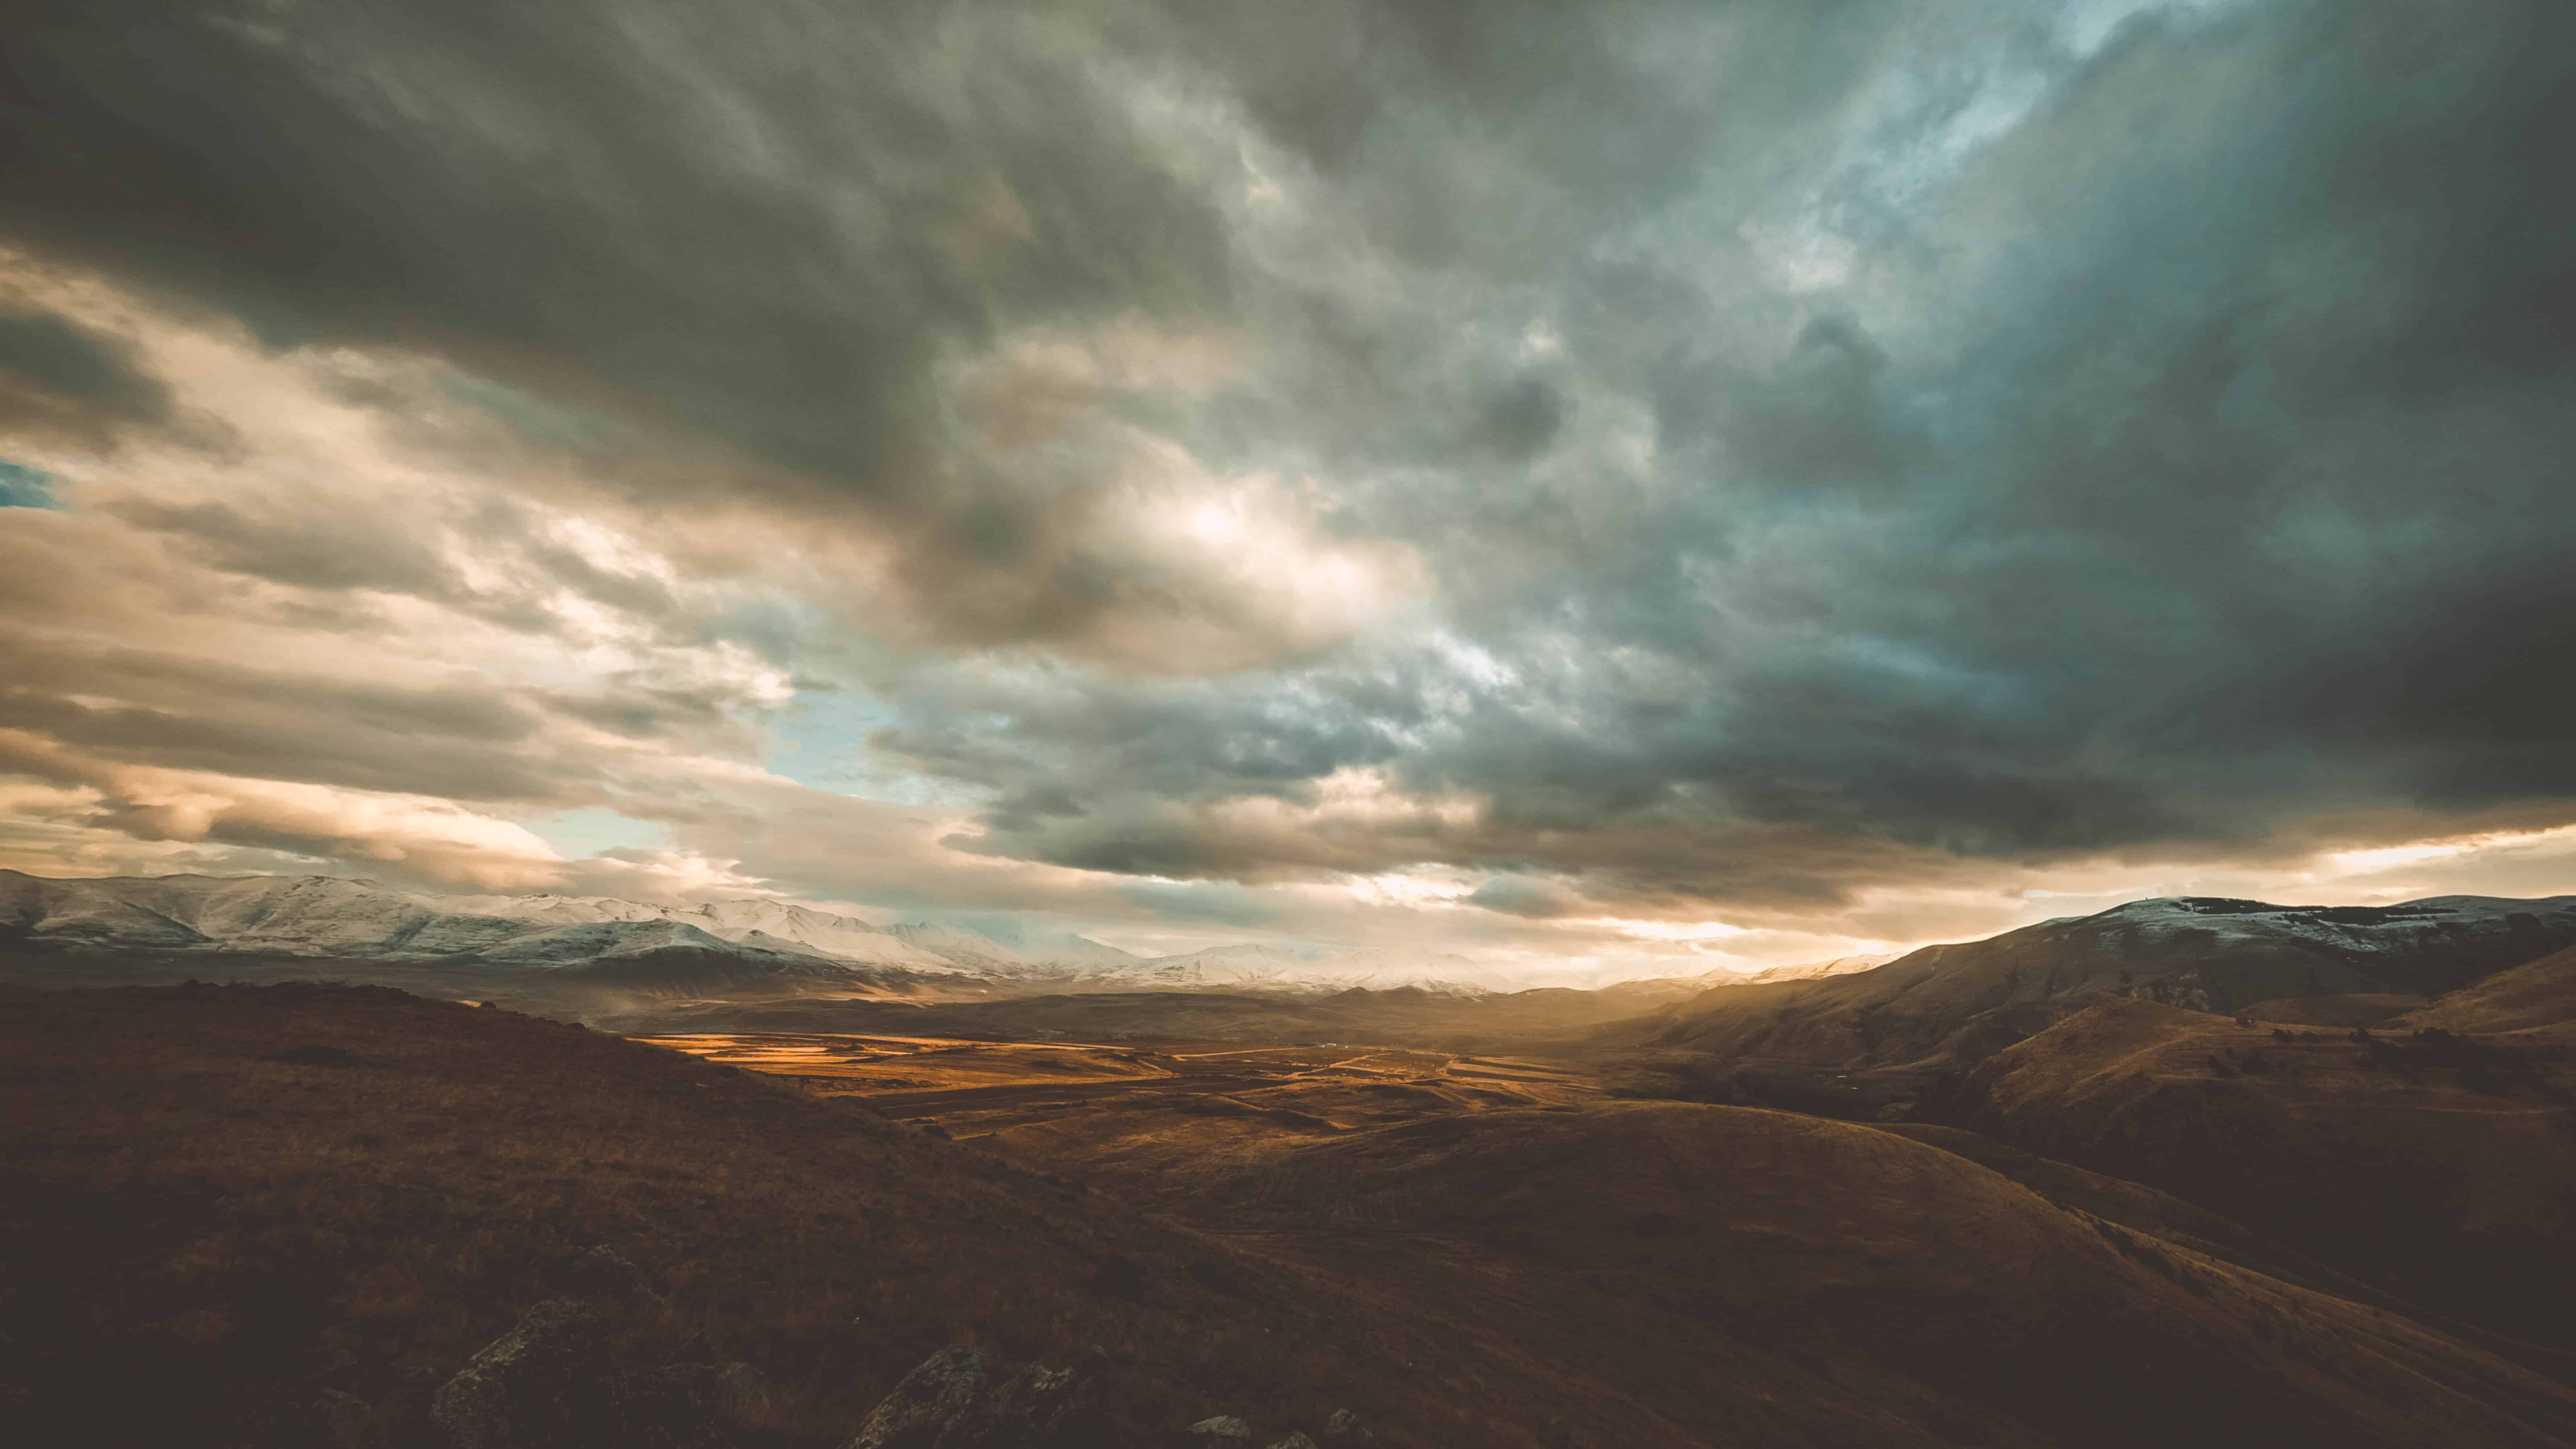 Hazy view of hillsides in Armenia